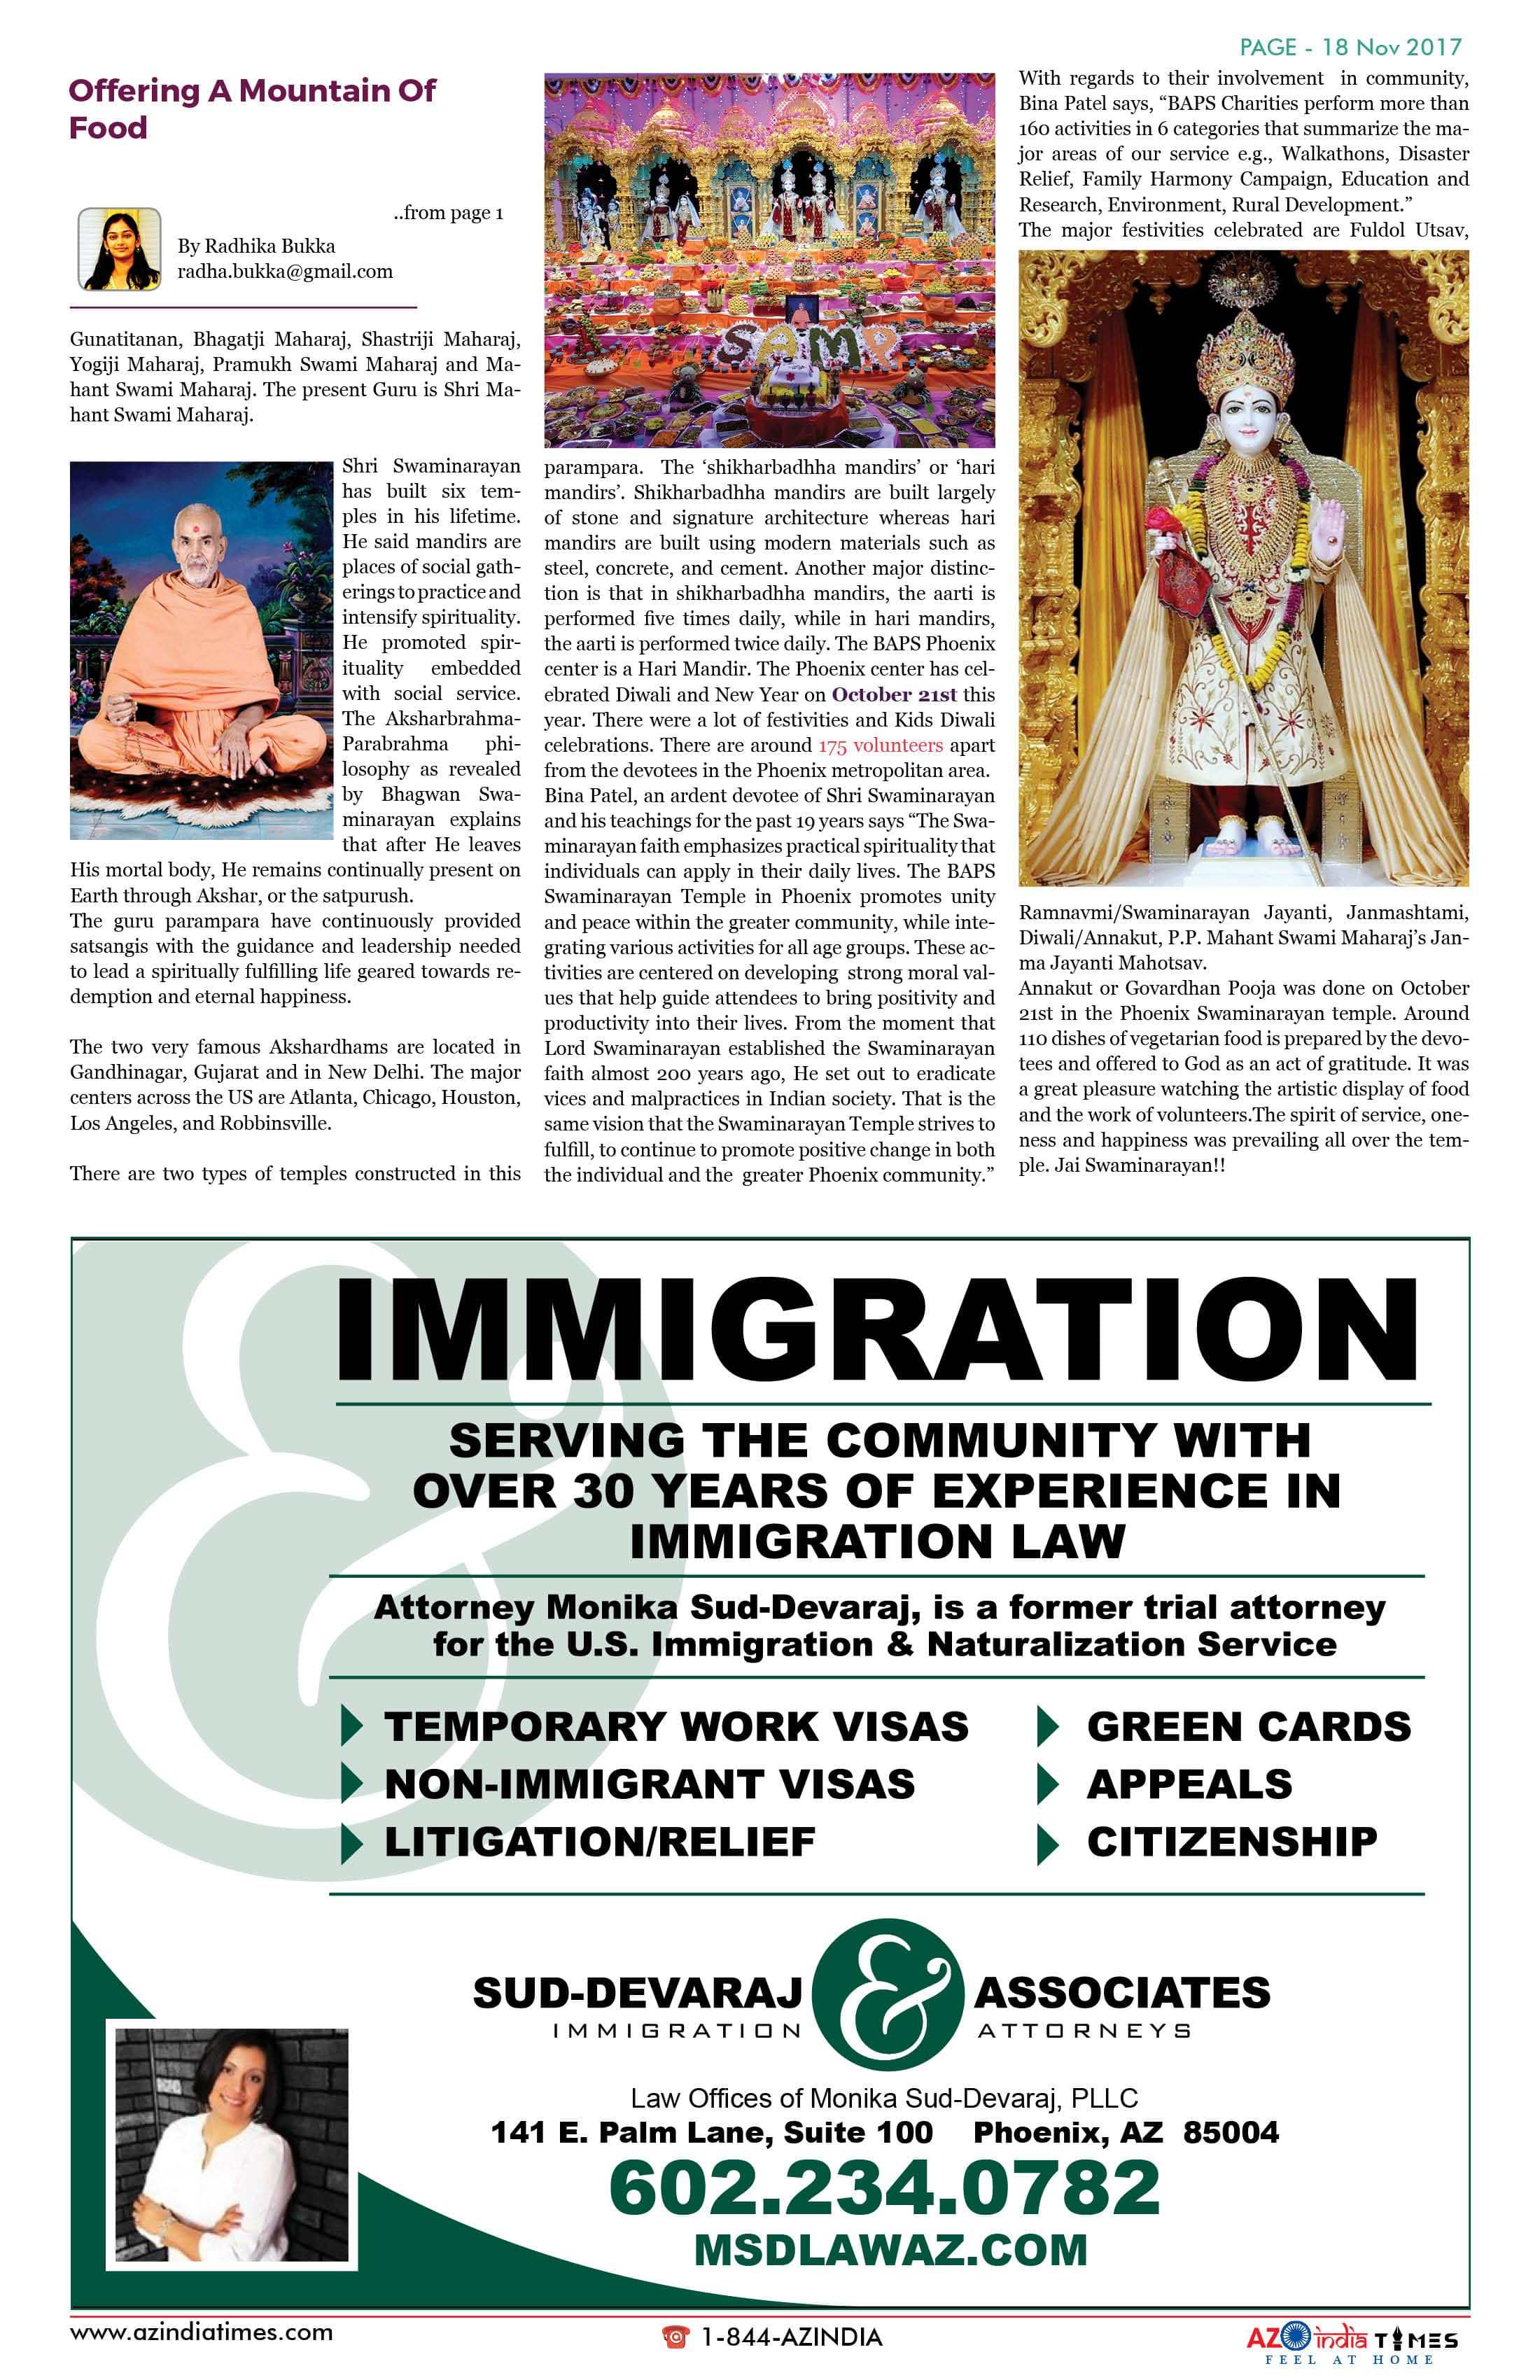 AZ INDIA TIMES NOVEMBER EDITION18